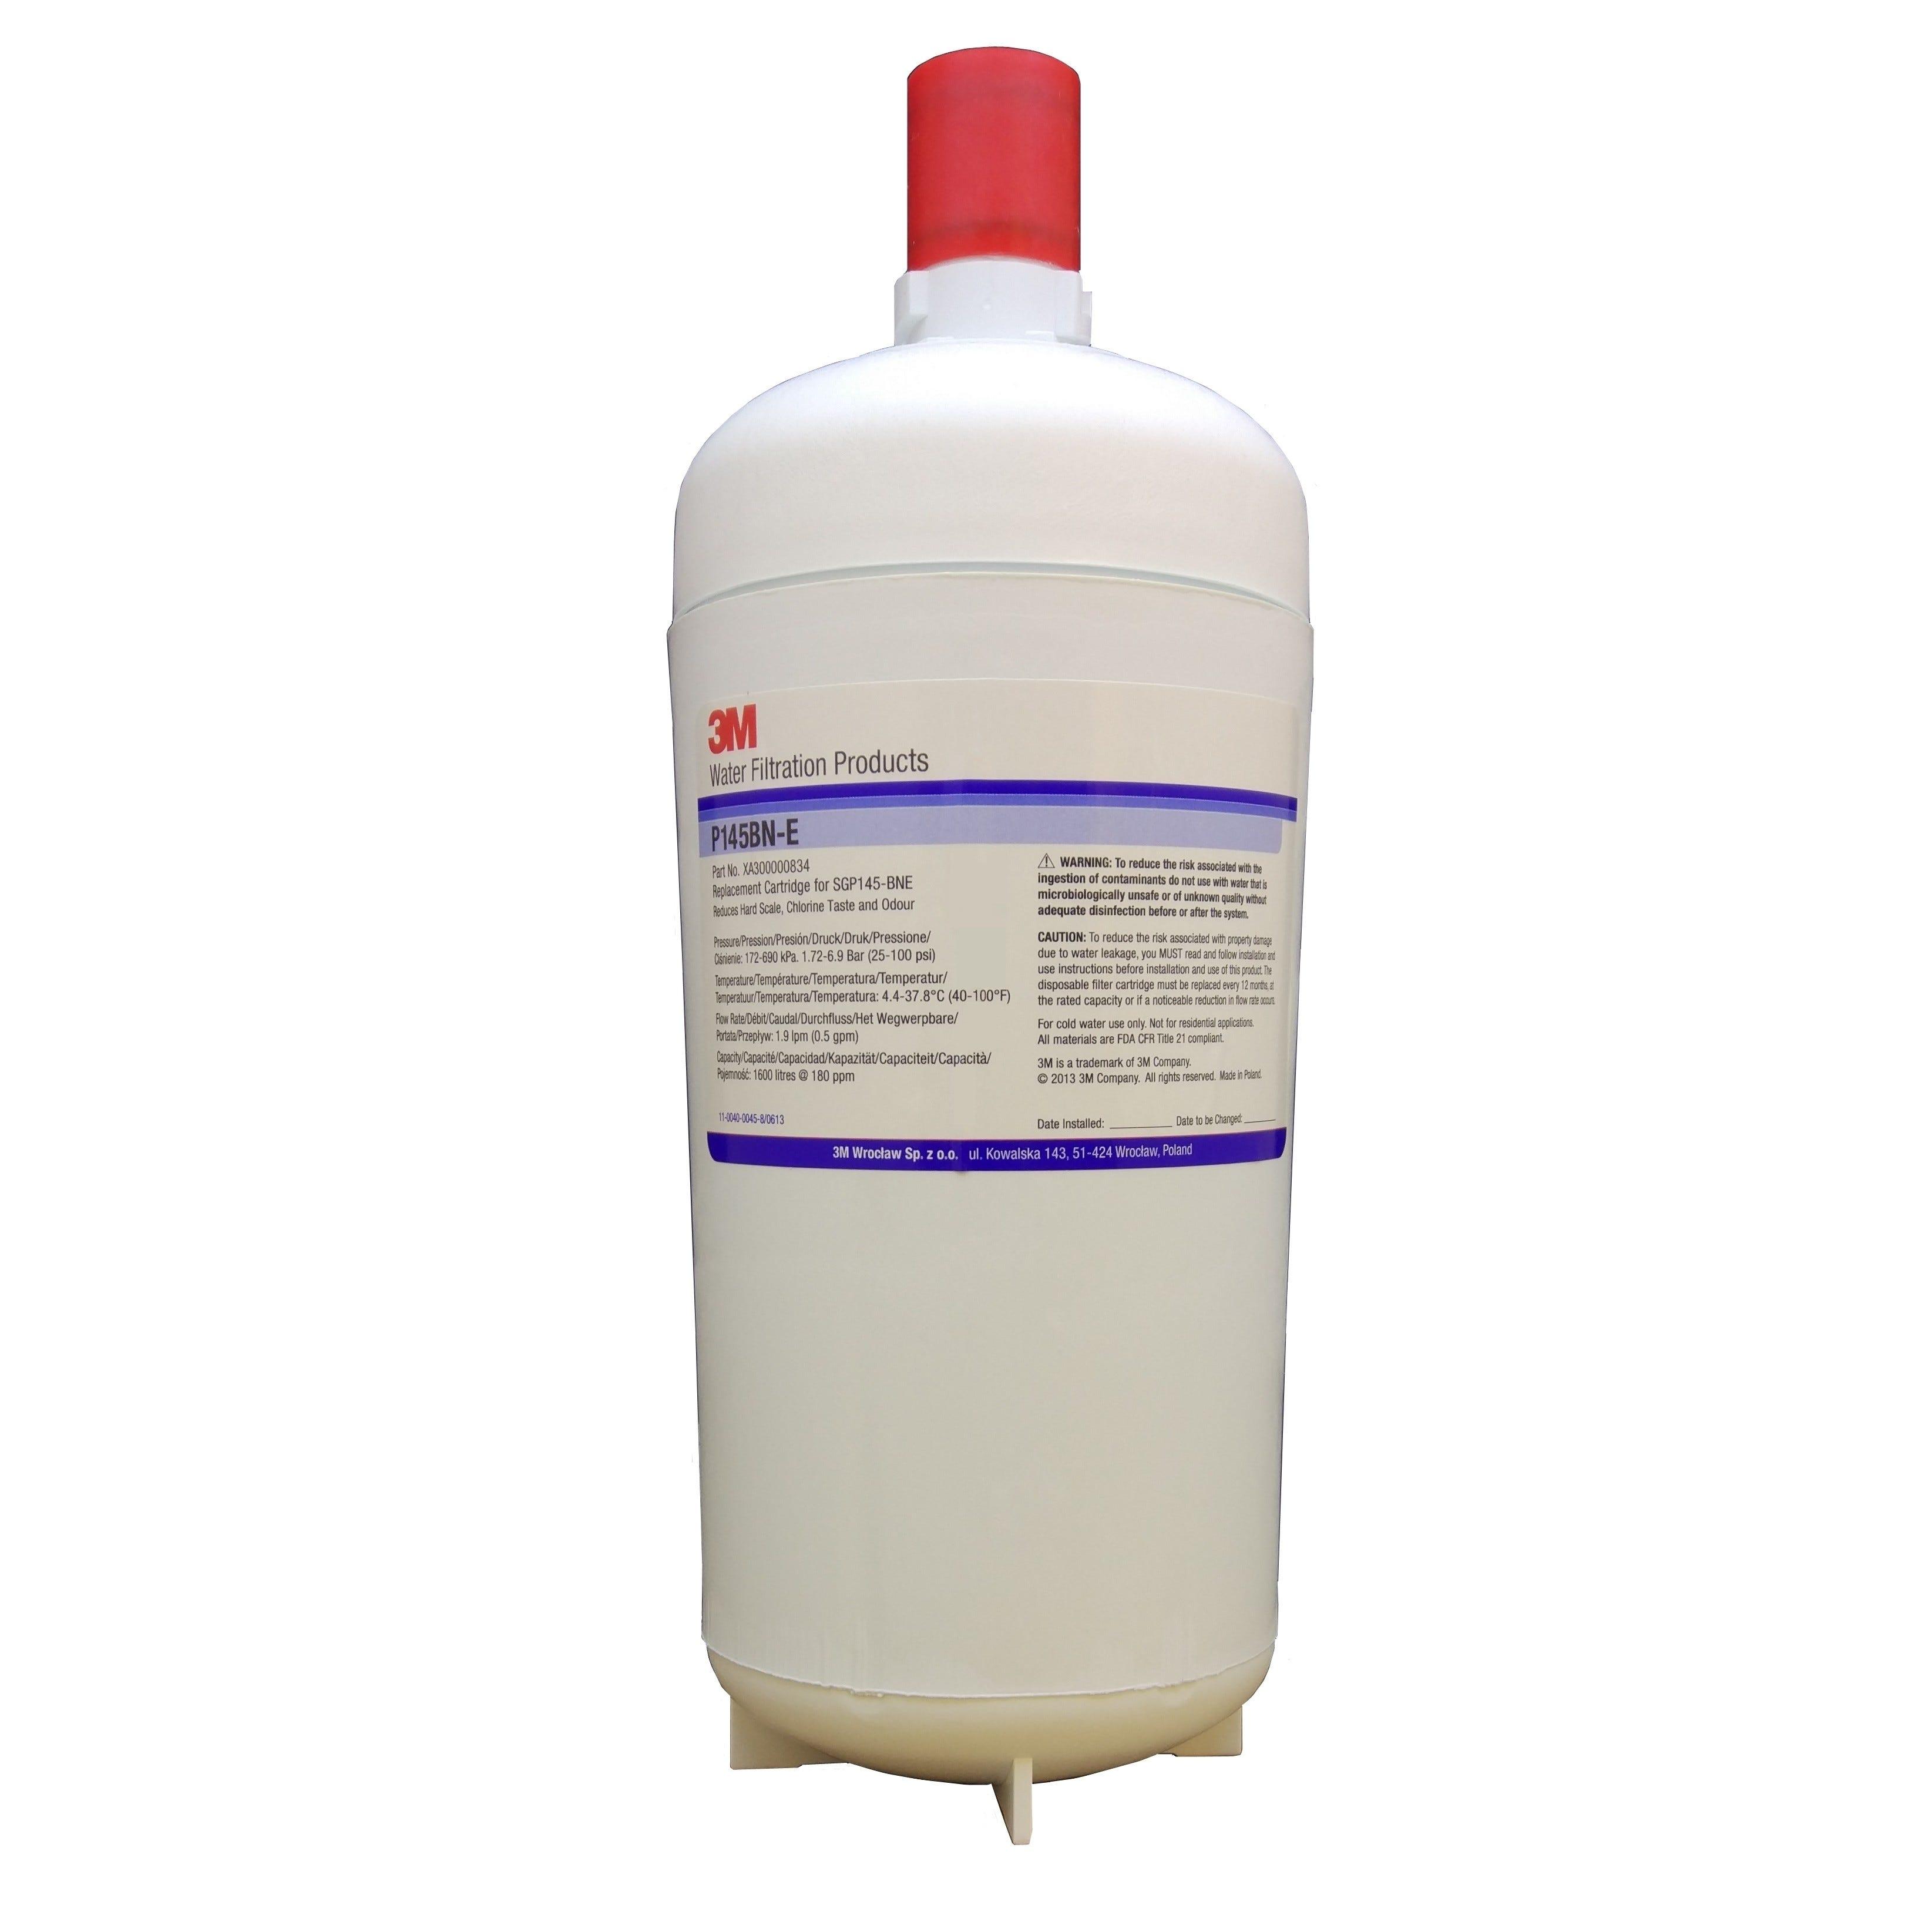 3M ScaleGard Pro SGP145BN-E Water Filter